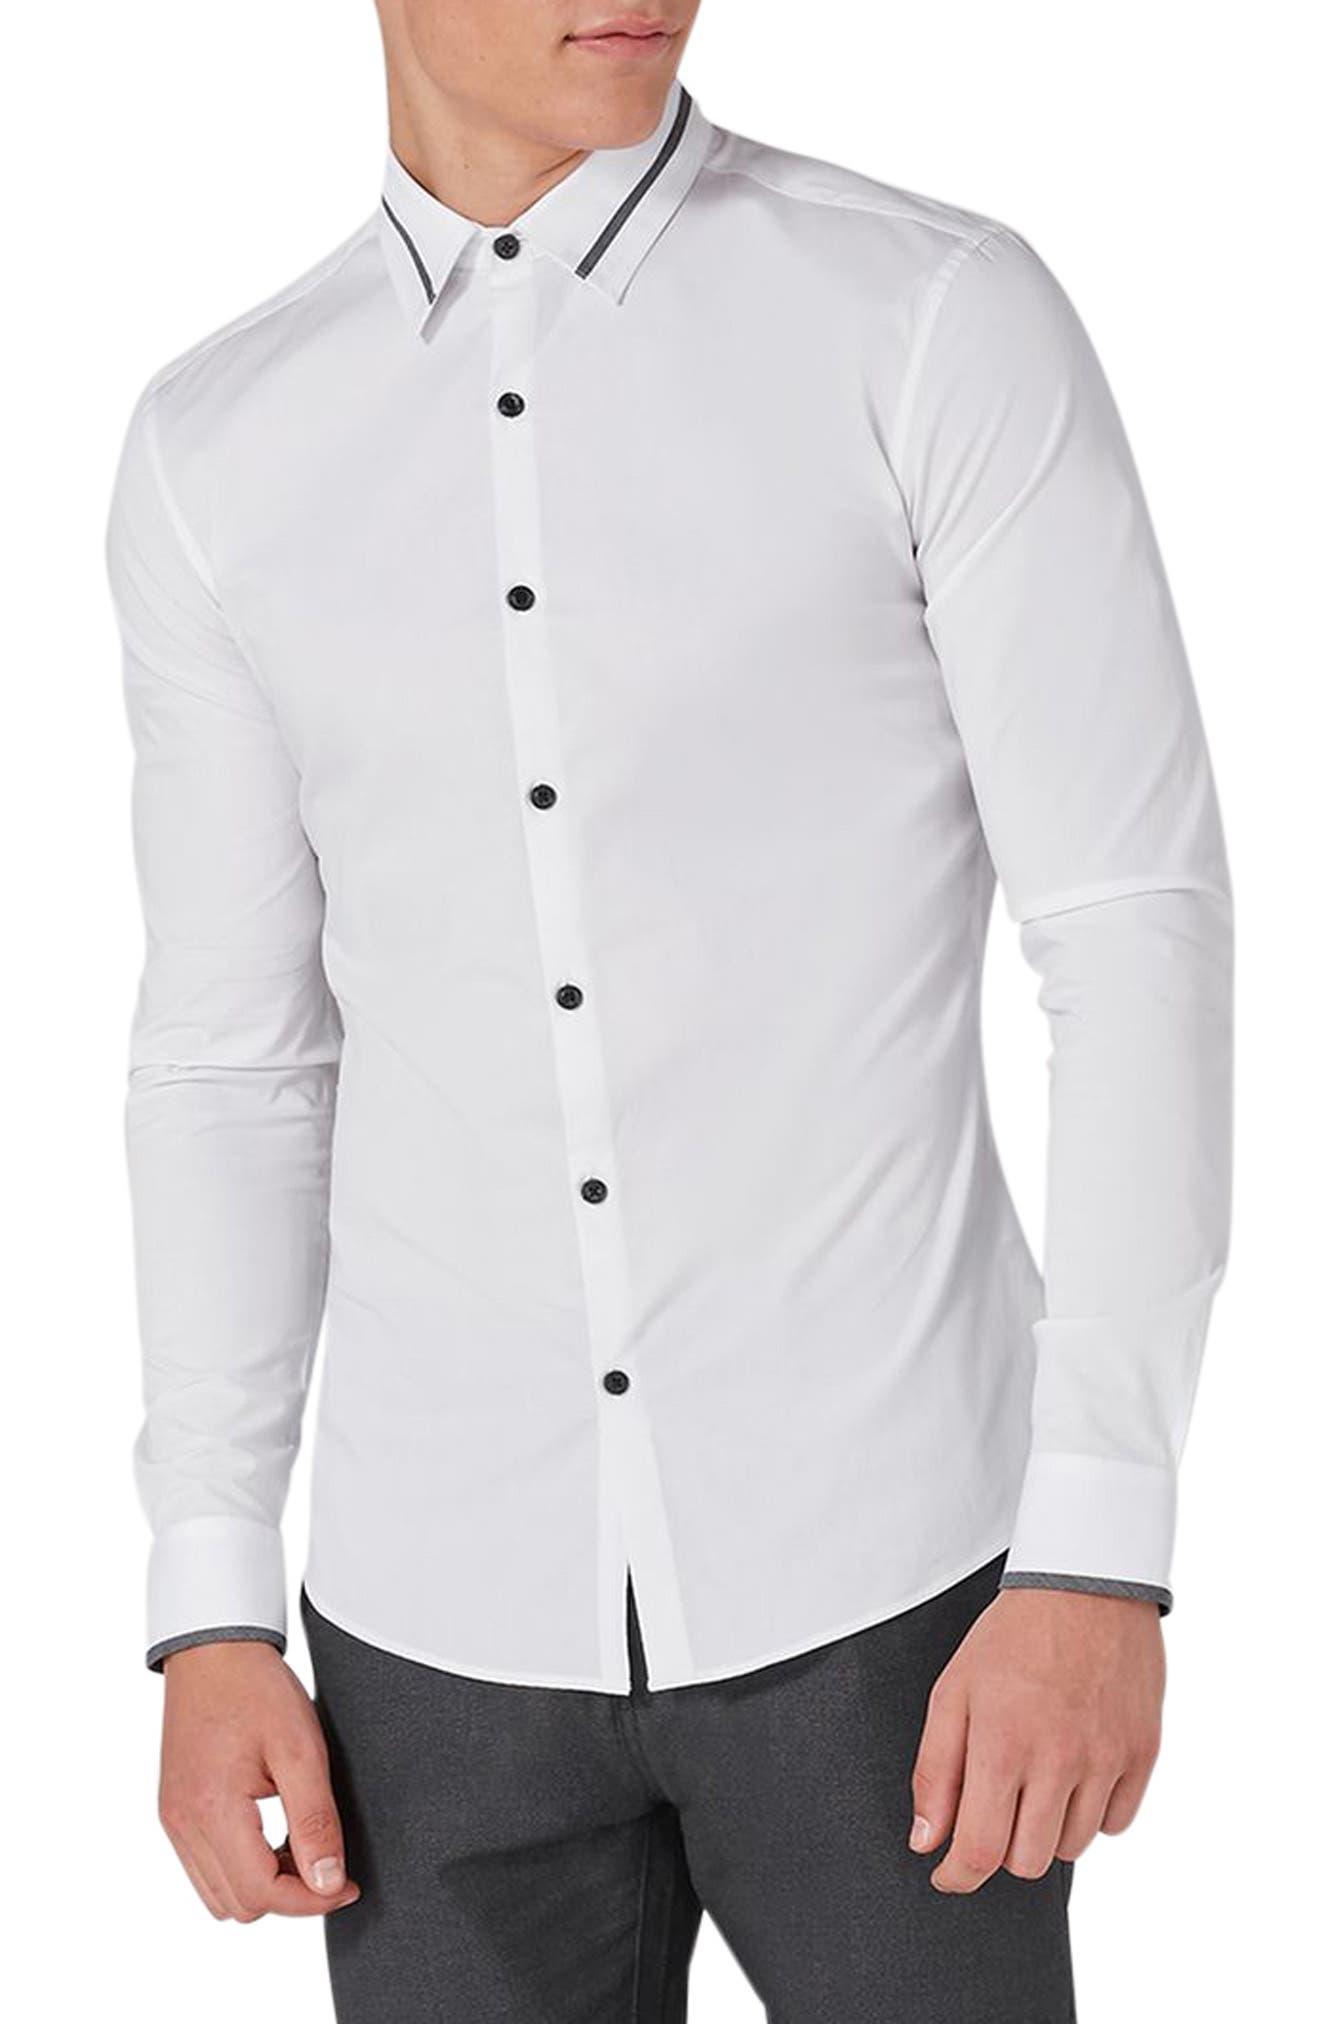 Main Image - Topman Muscle Fit Contrast Trim Smart Shirt